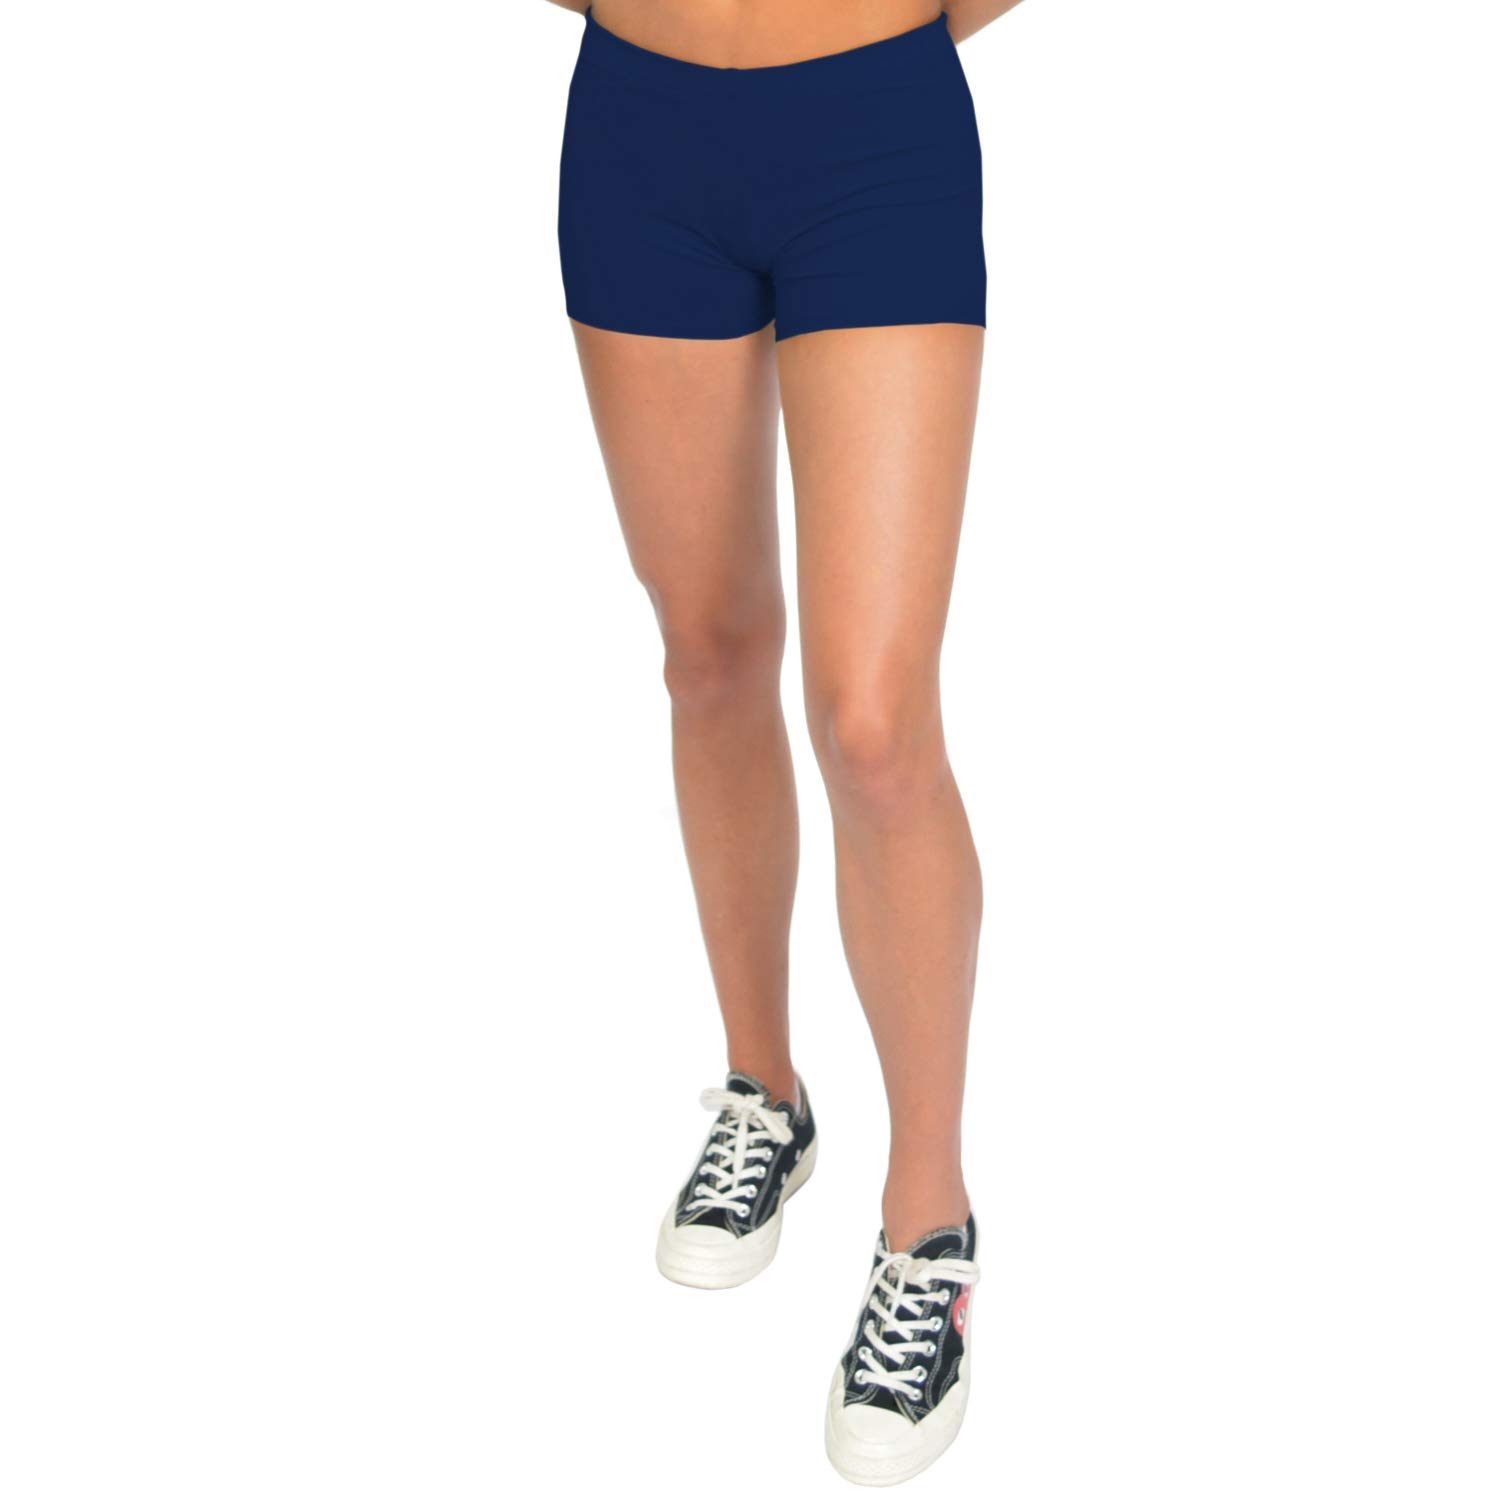 Navy bluee Stretch is Comfort Women's NYLON SPANDEX Stretch Booty Shorts